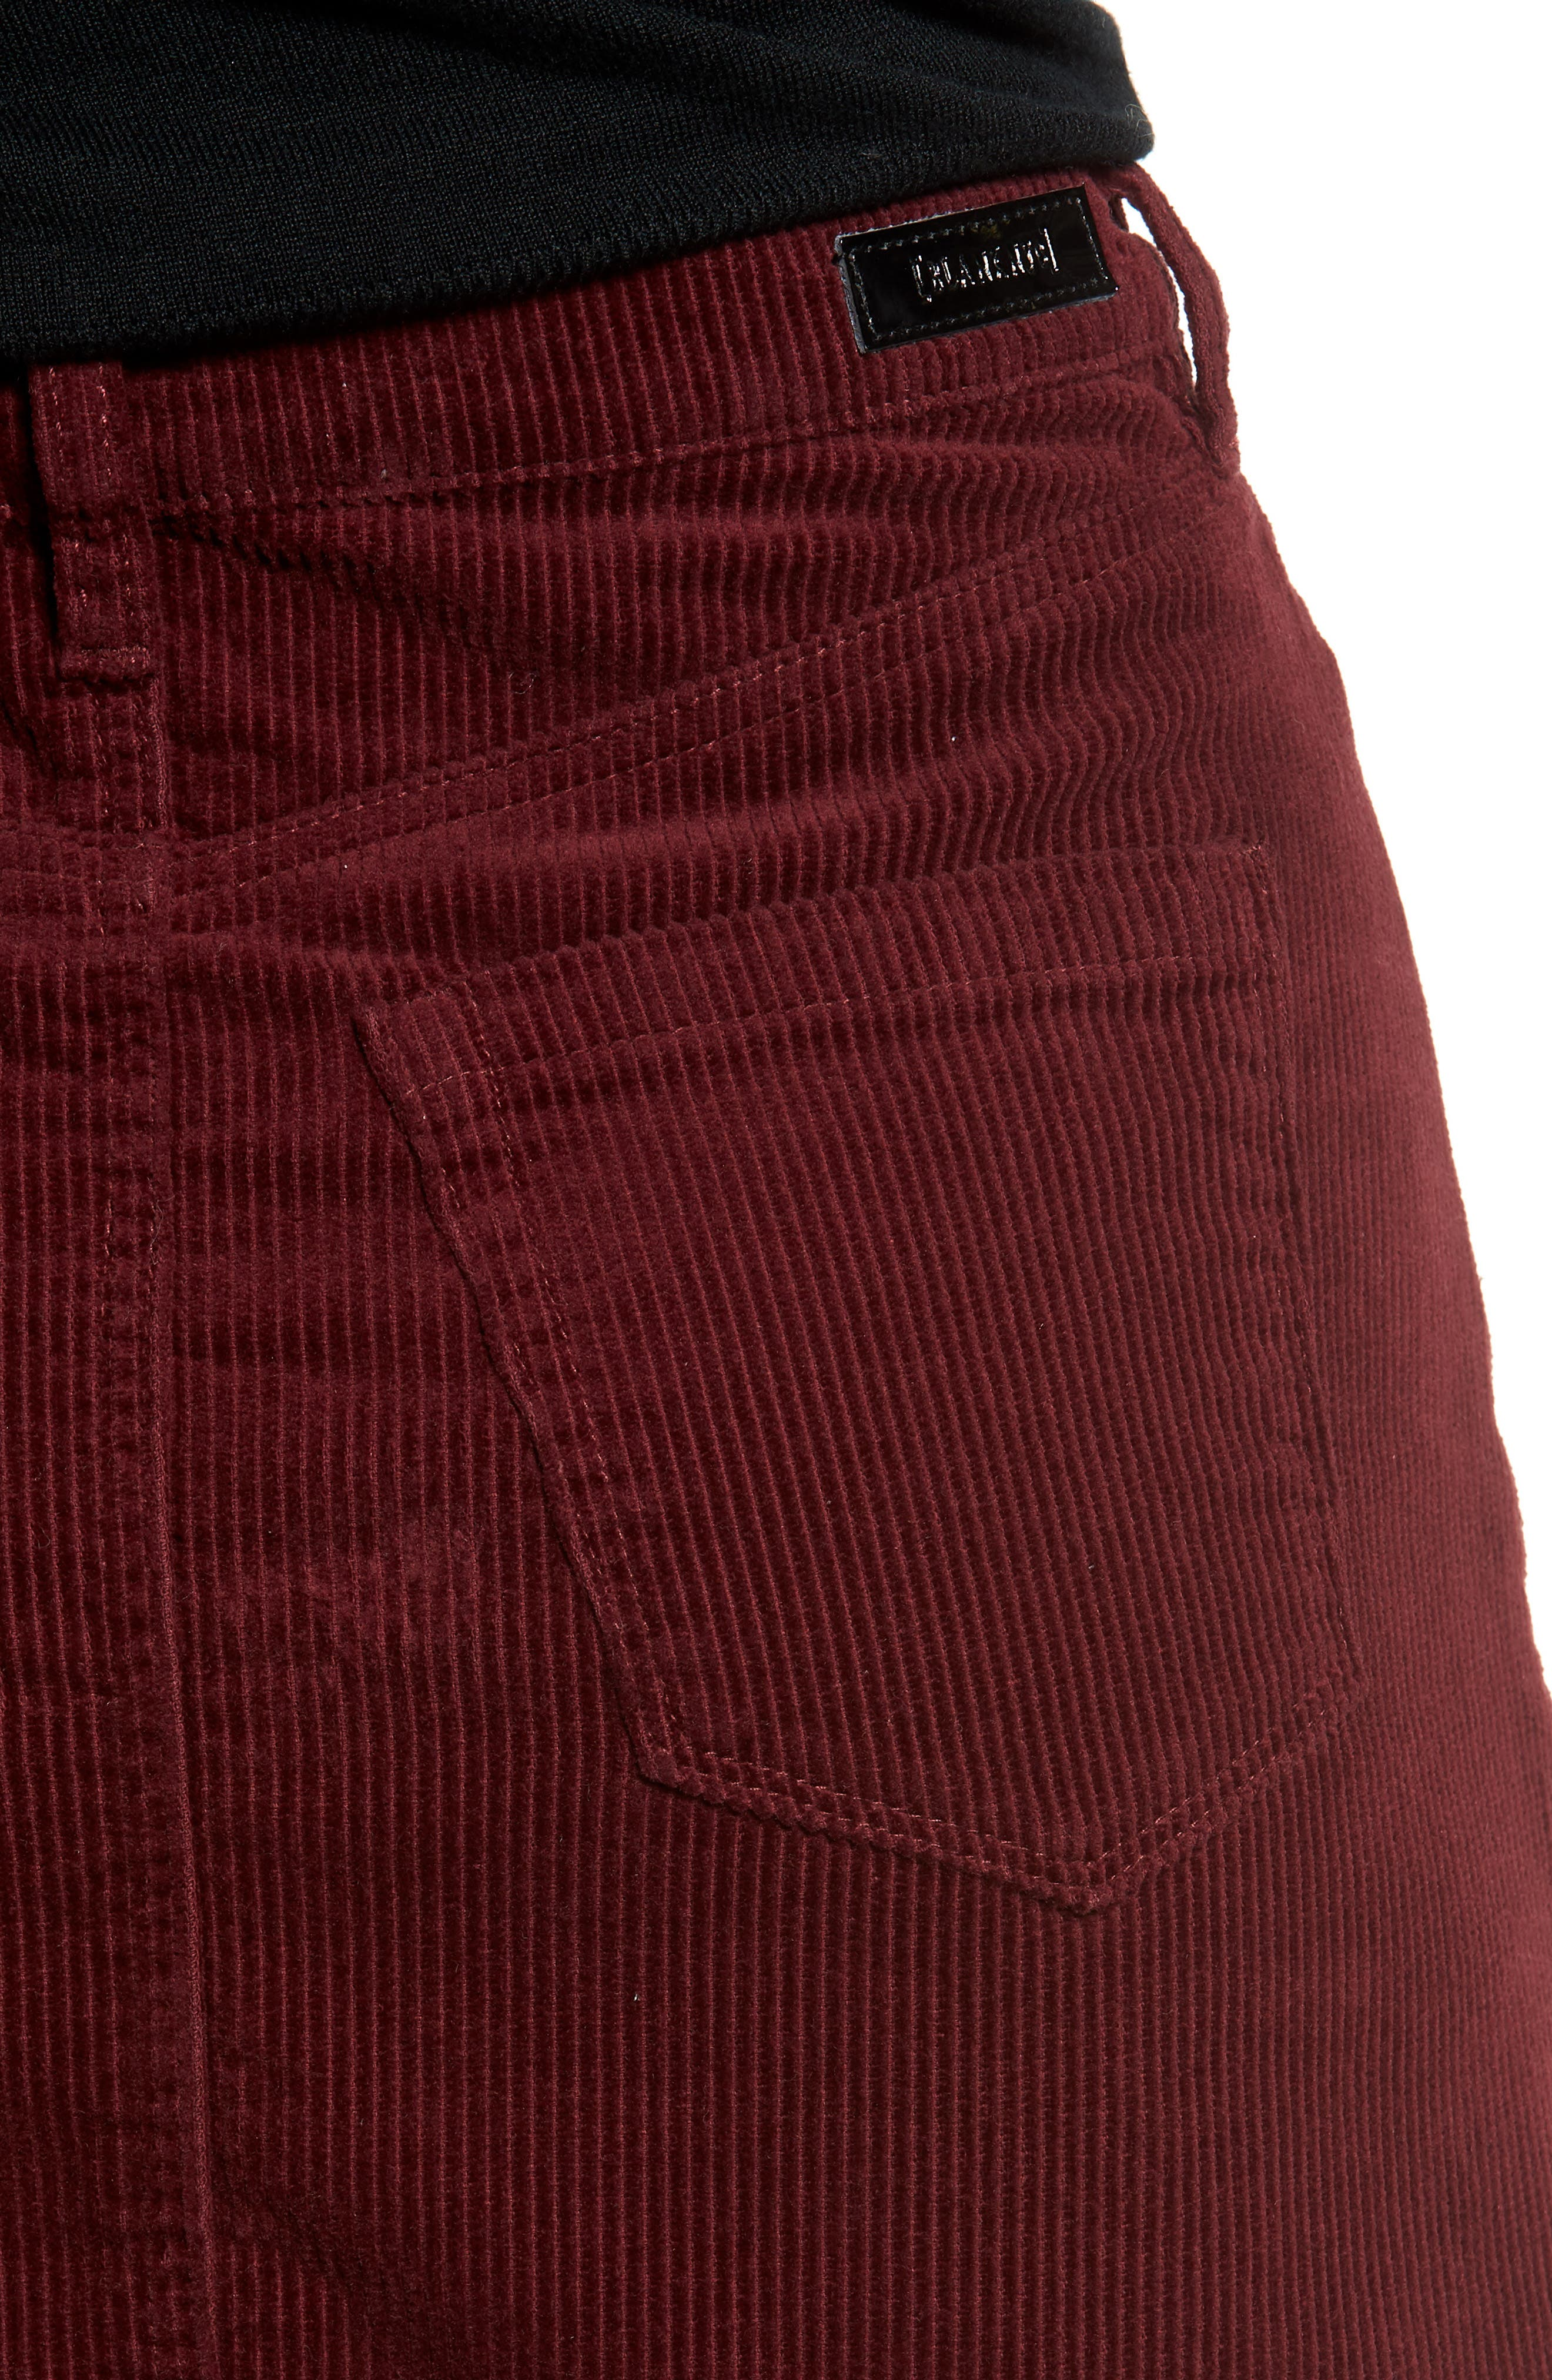 Corduroy A-Line Miniskirt,                             Alternate thumbnail 4, color,                             MERLOT